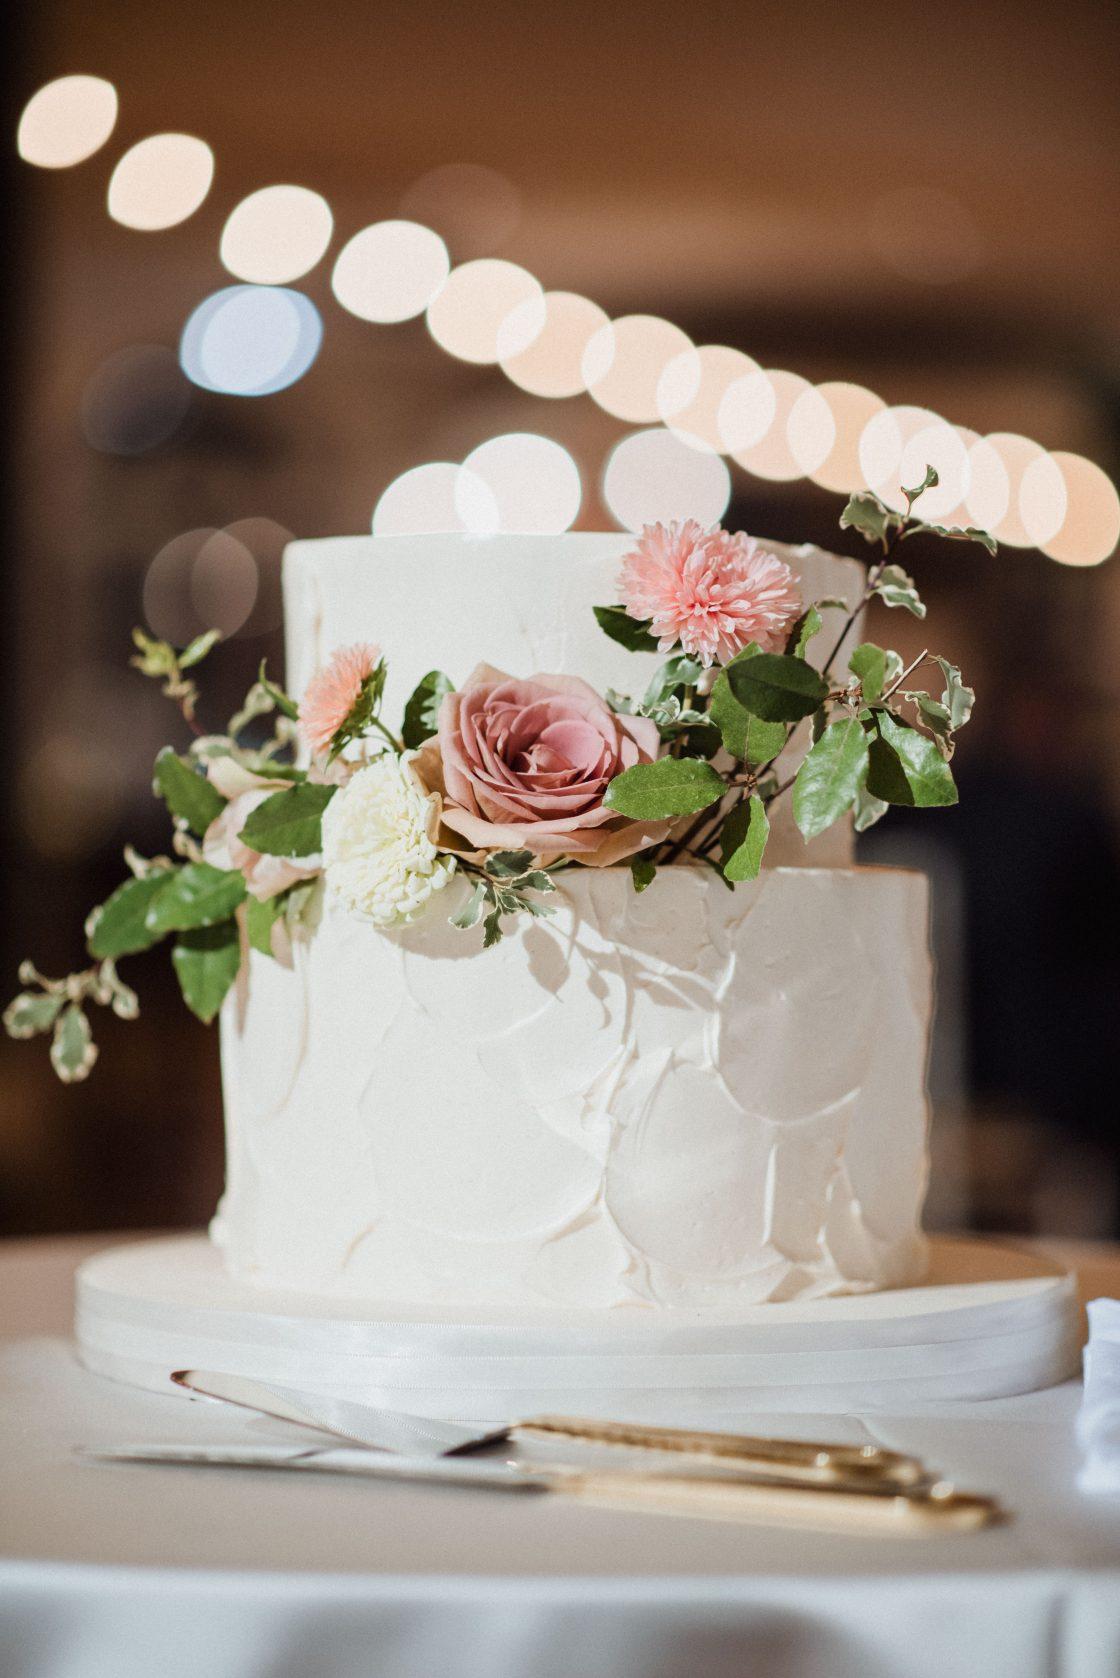 Classic Garden Wedding Cake with Fresh Flowers